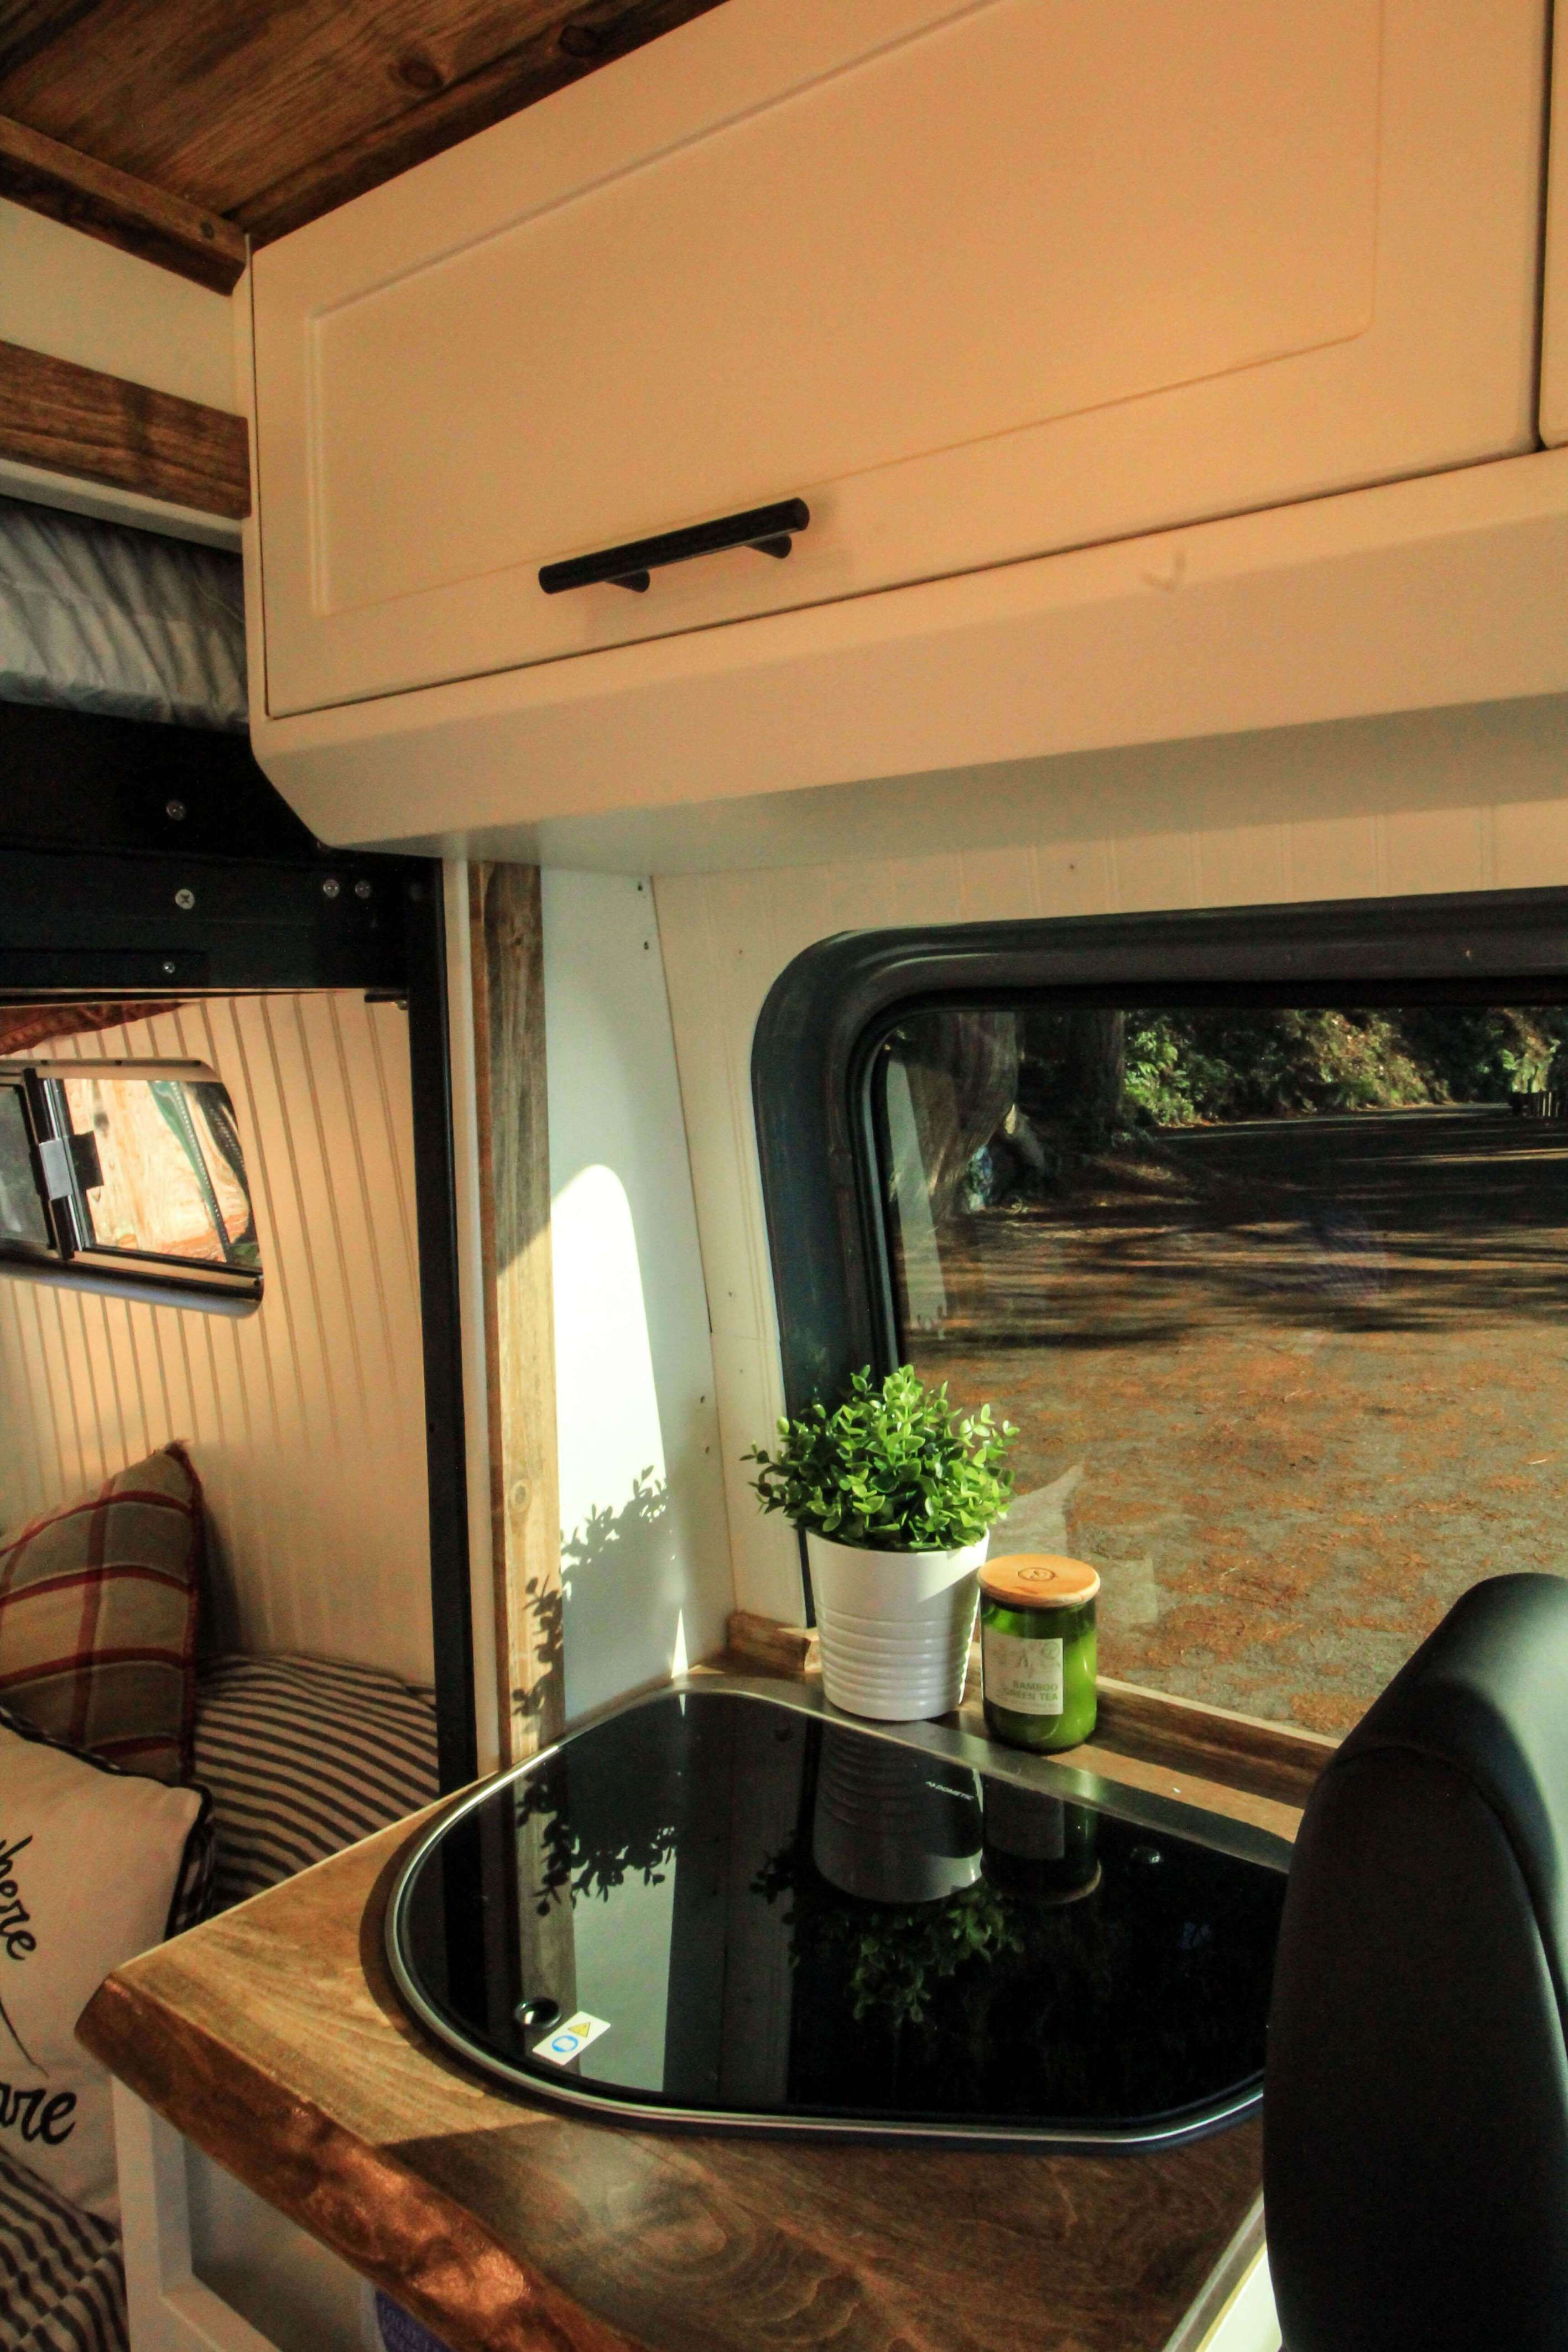 The Family Van Conversion Van conversion interior